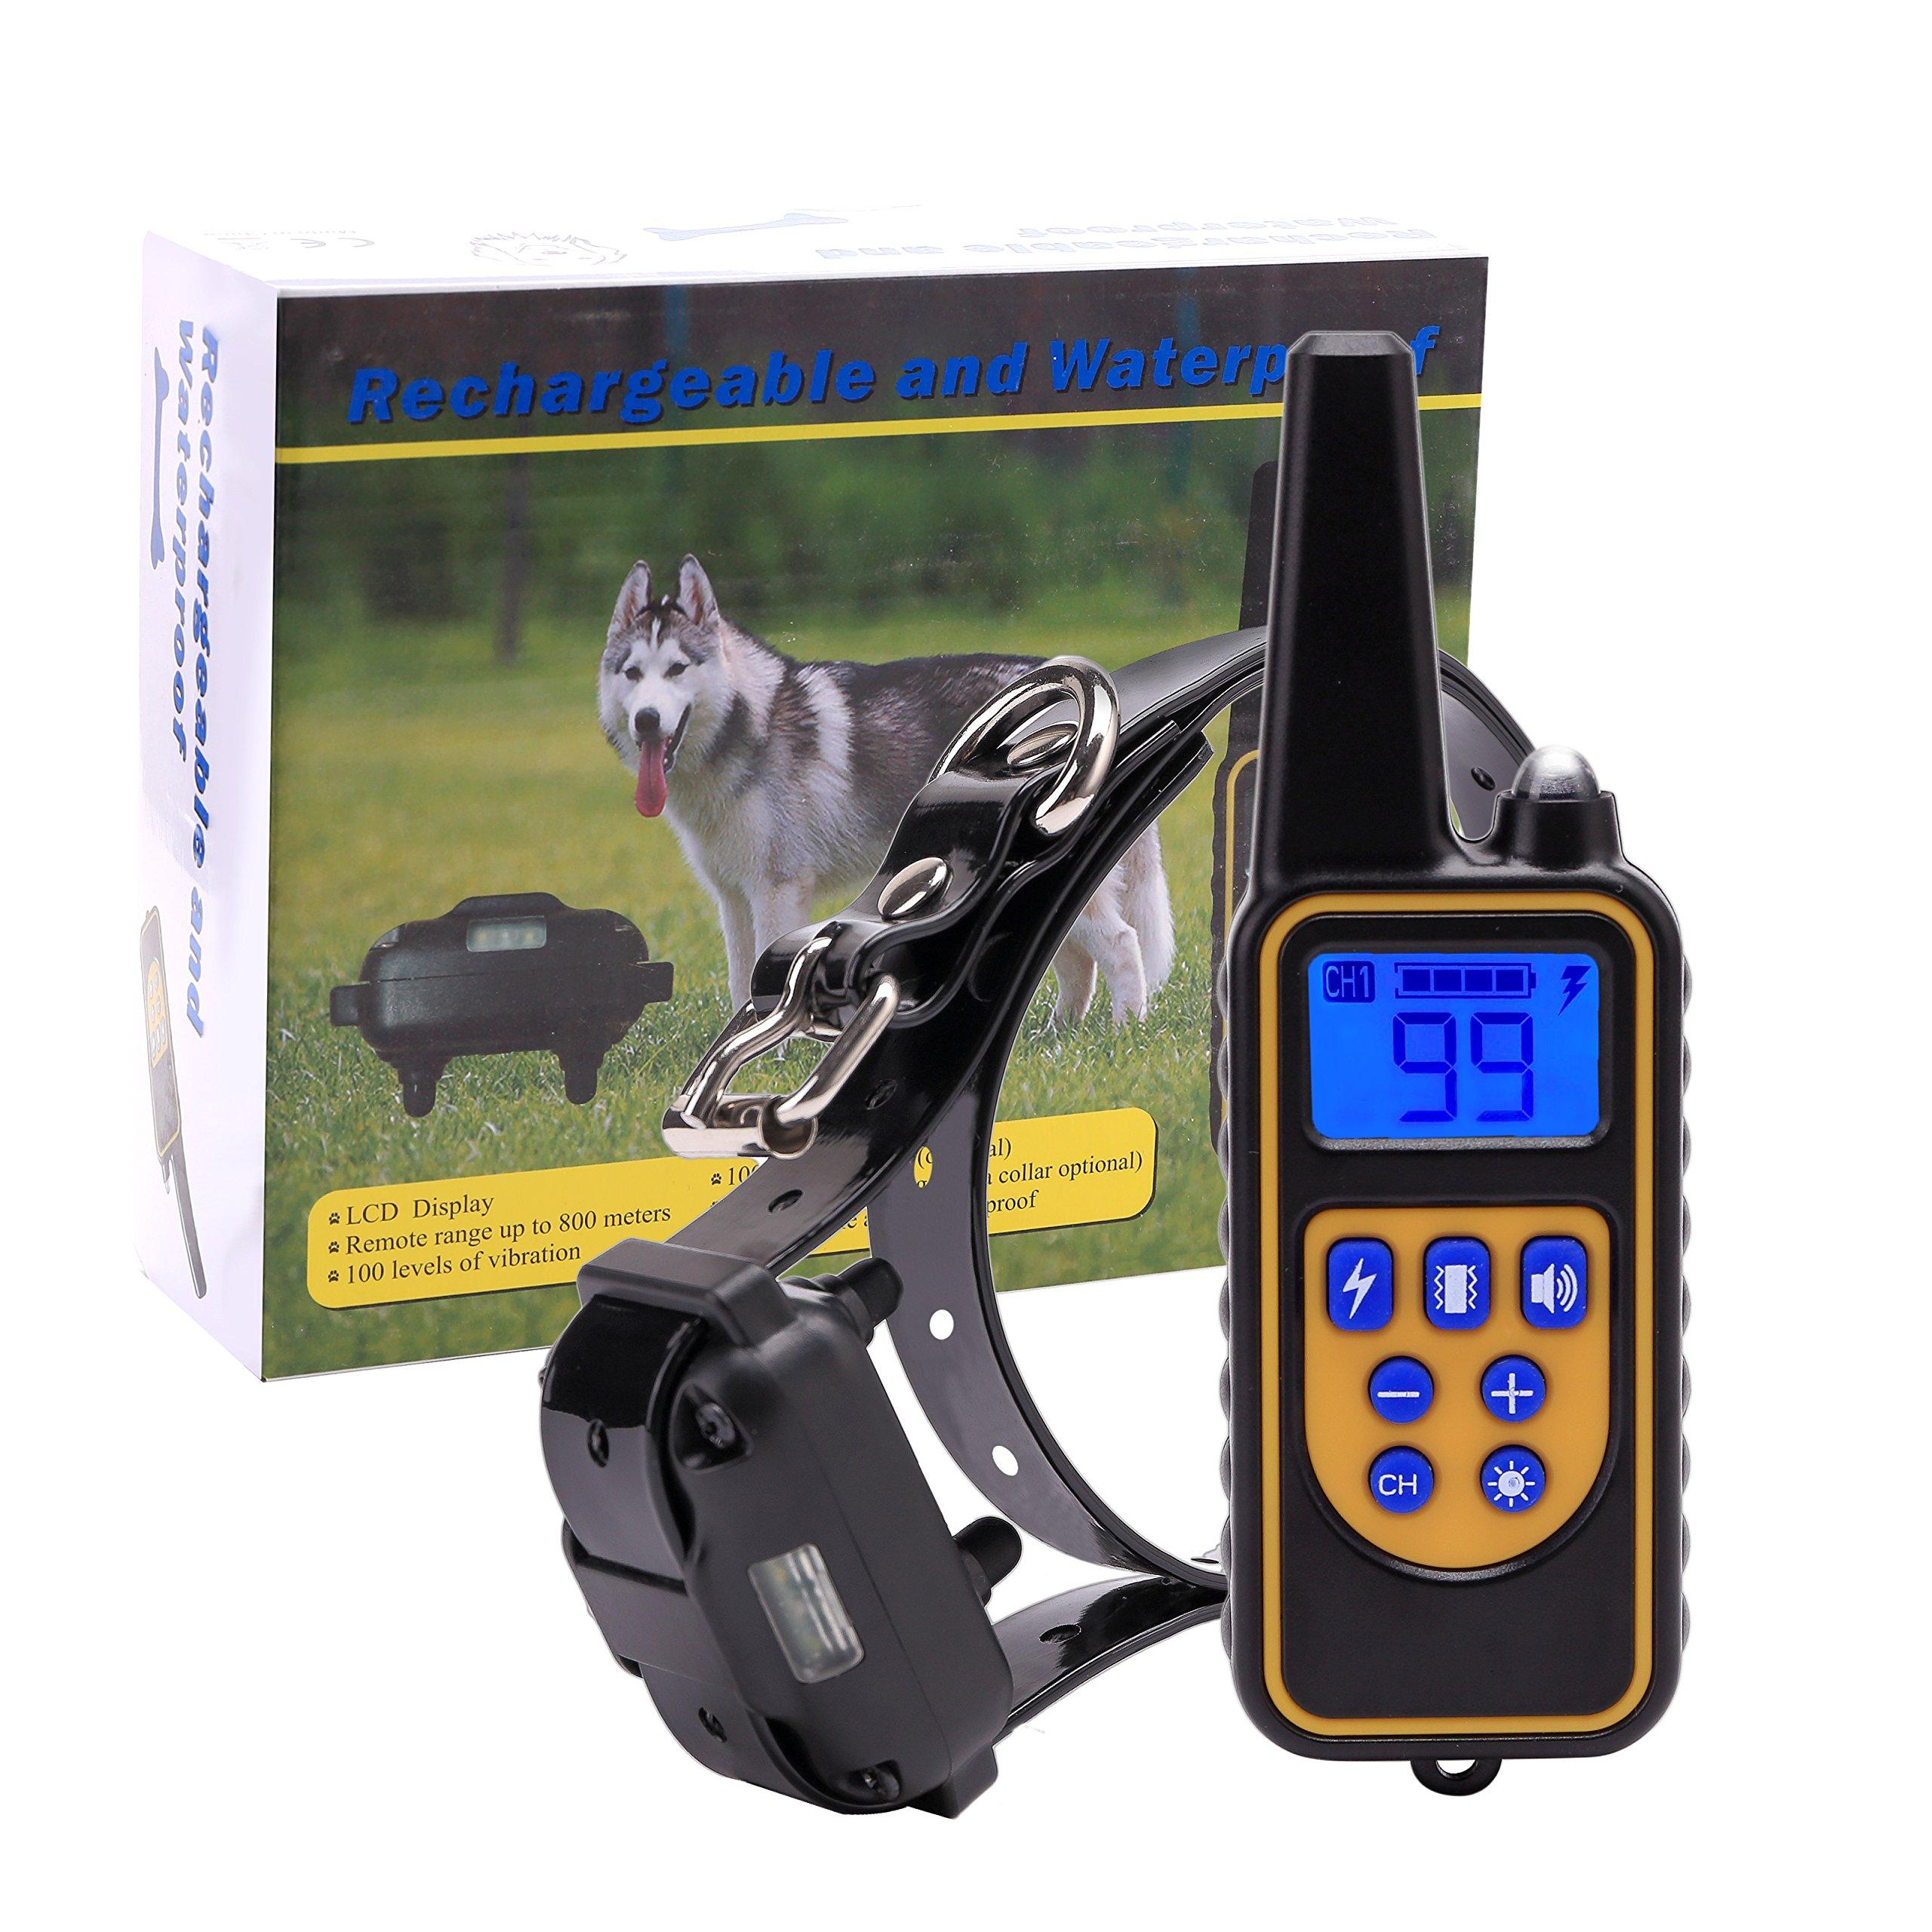 EtekCollar Dog Training Collar Rechargeable and Waterproof800 Yards Range Rem